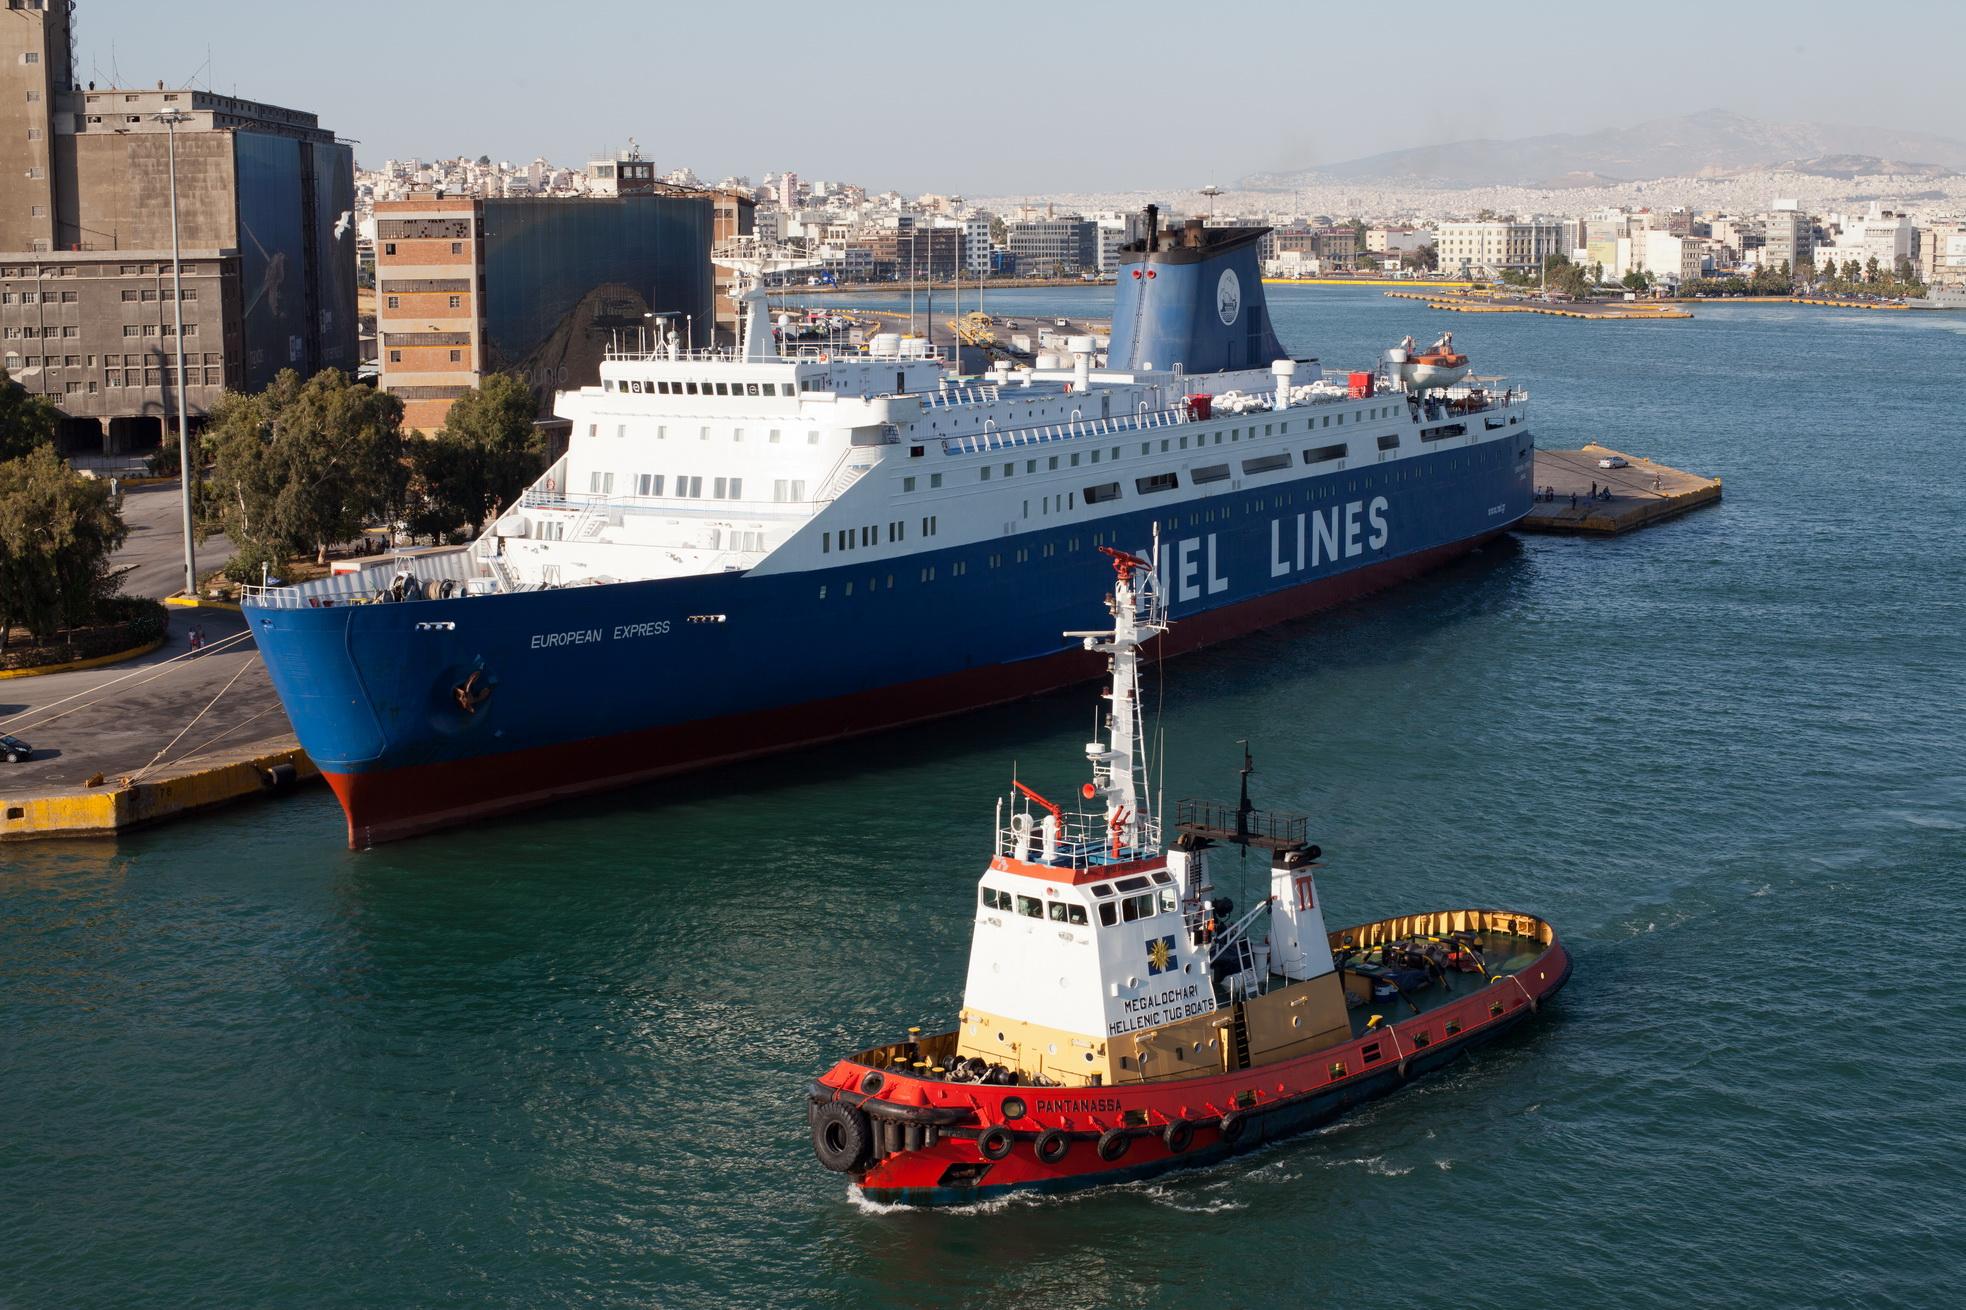 Tugboat Pantanassa IMO 7400936 and MS European Express Limassol Nel Lines Piraeus Athens Greece 01